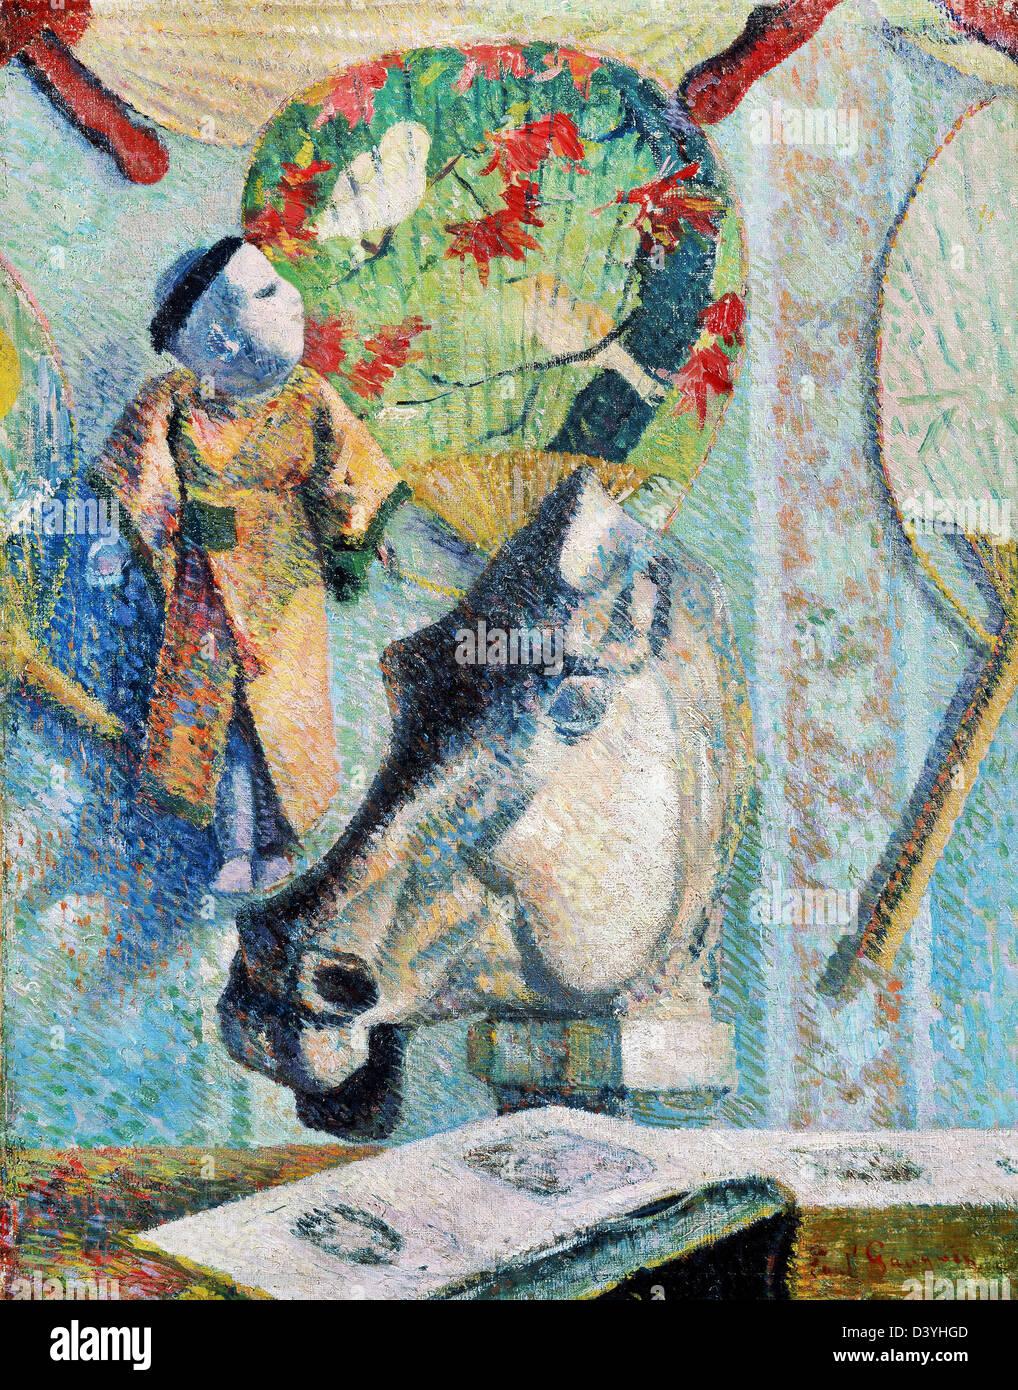 Paul Gauguin, Horse's Head 1886 Oil on canvas. Bridgestone Museum of Art, Tokyo - Stock Image